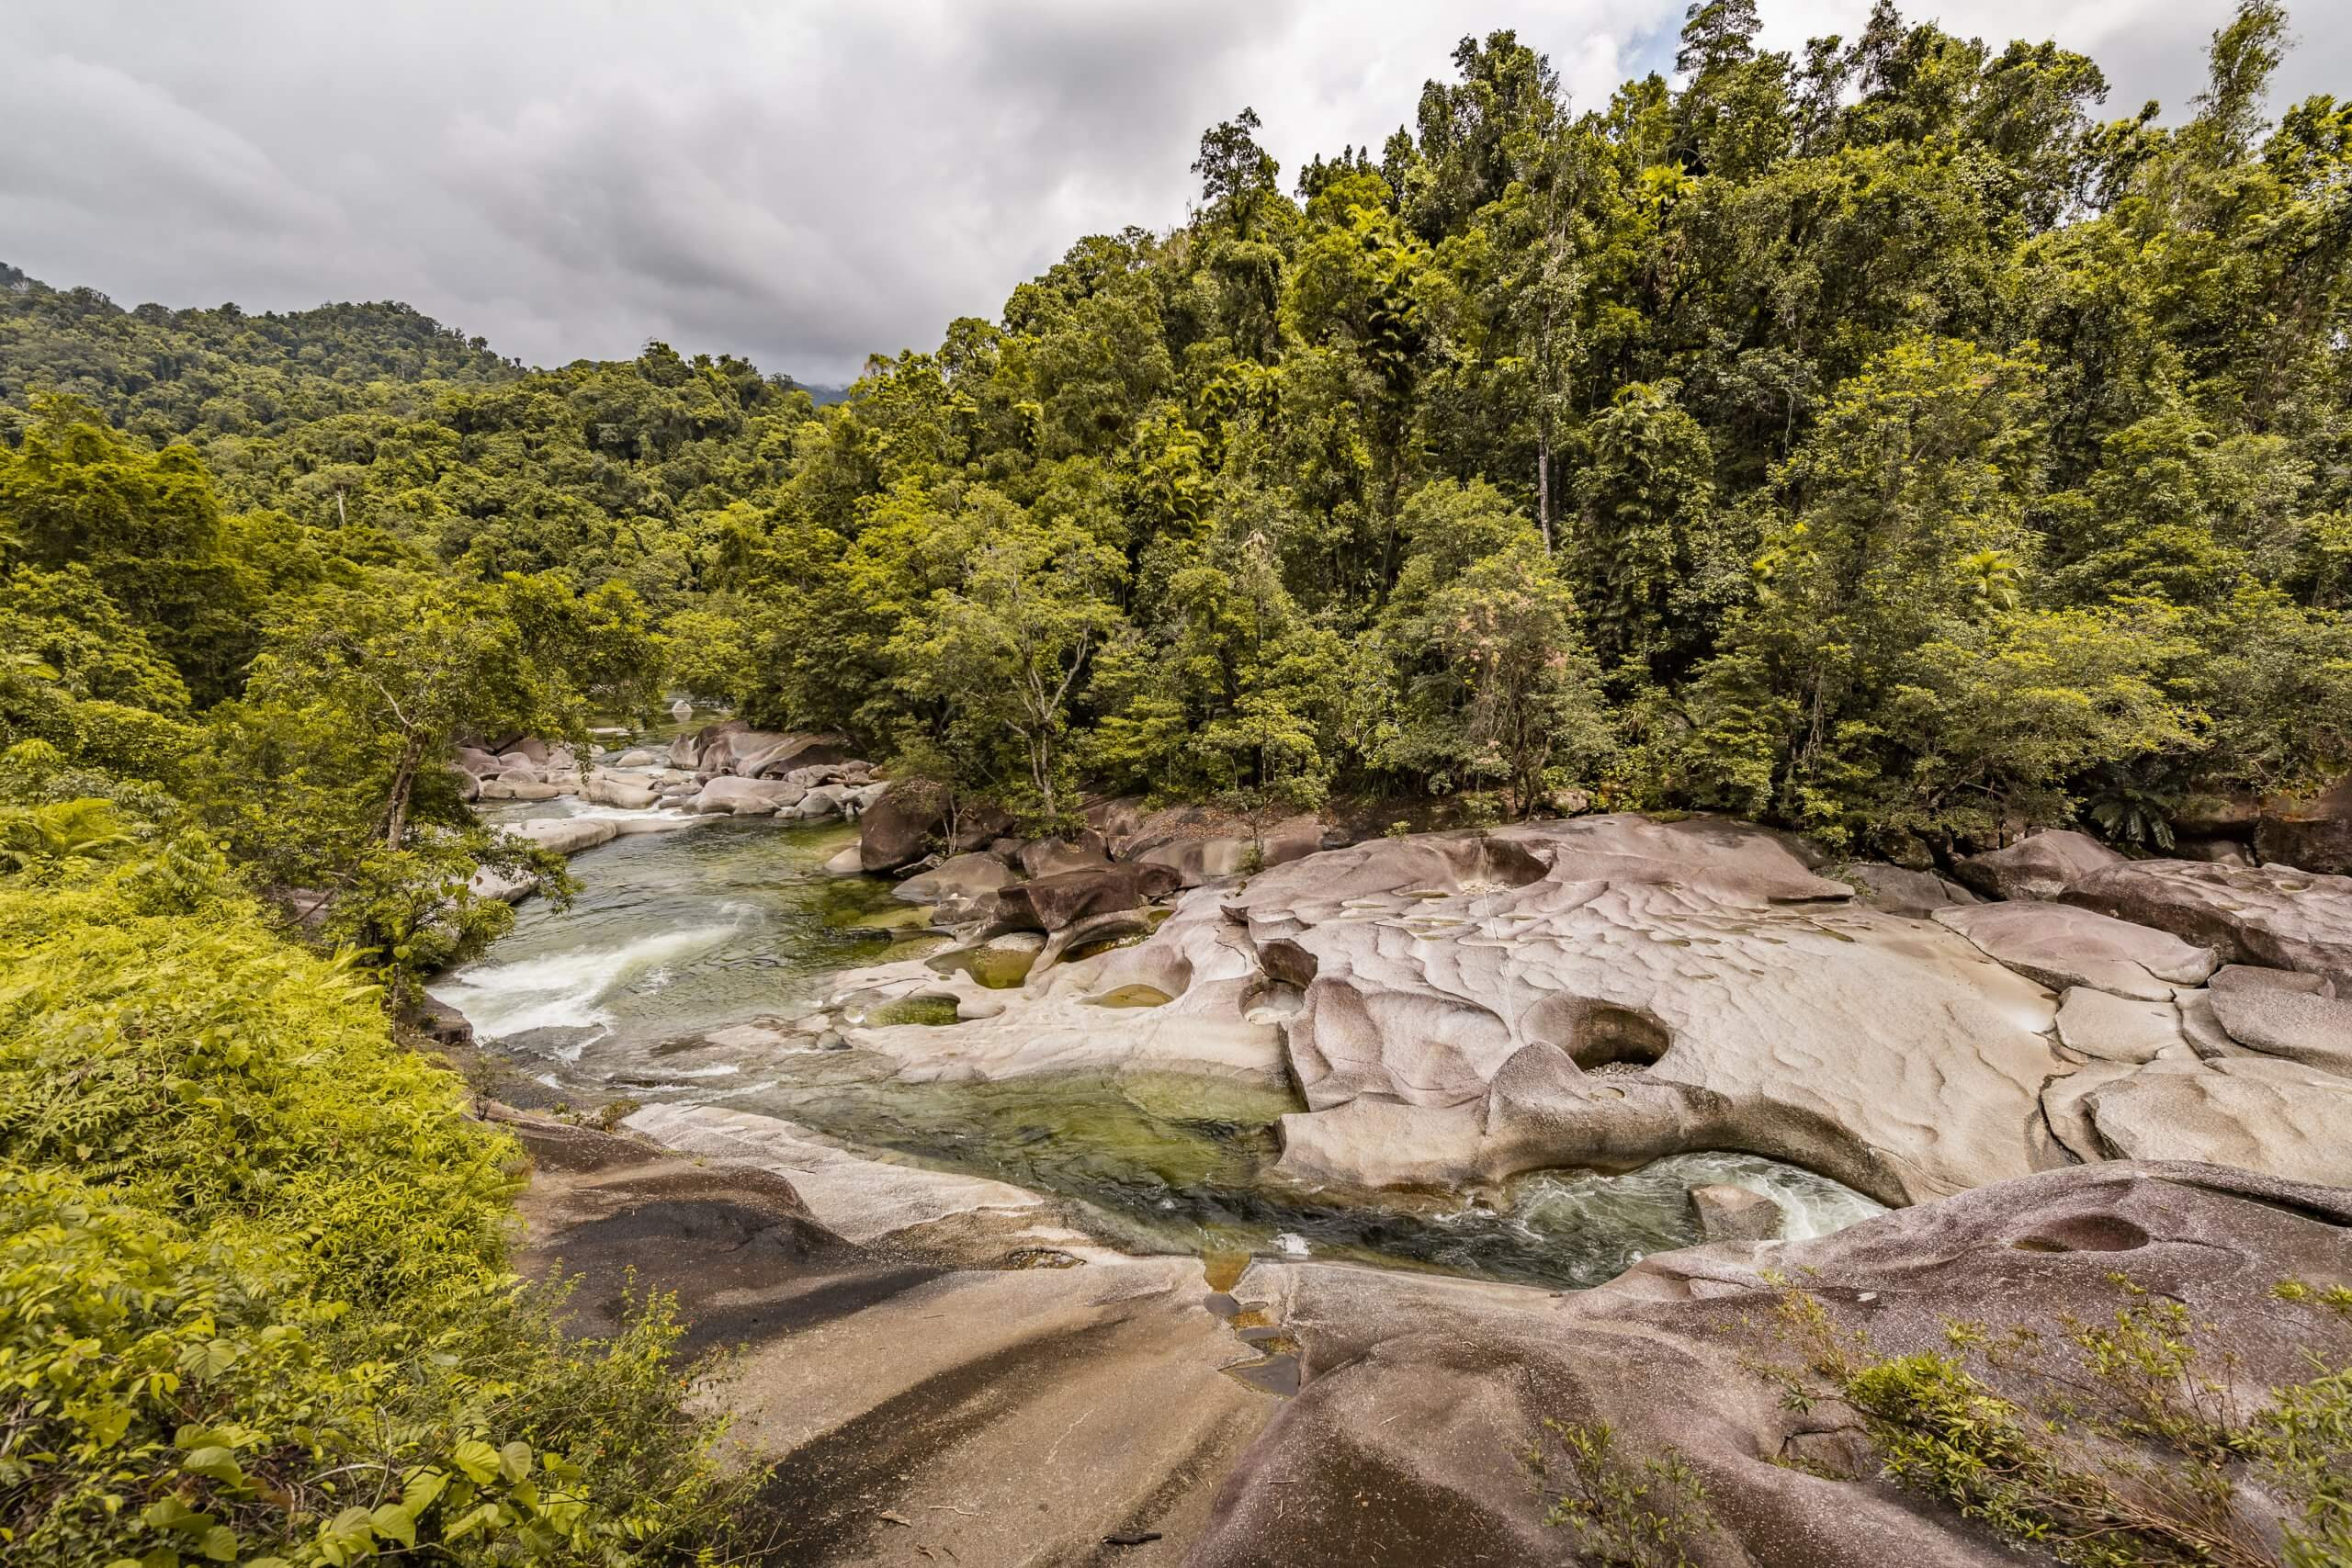 das spektakuläre Flusstal der Babinda Boulders